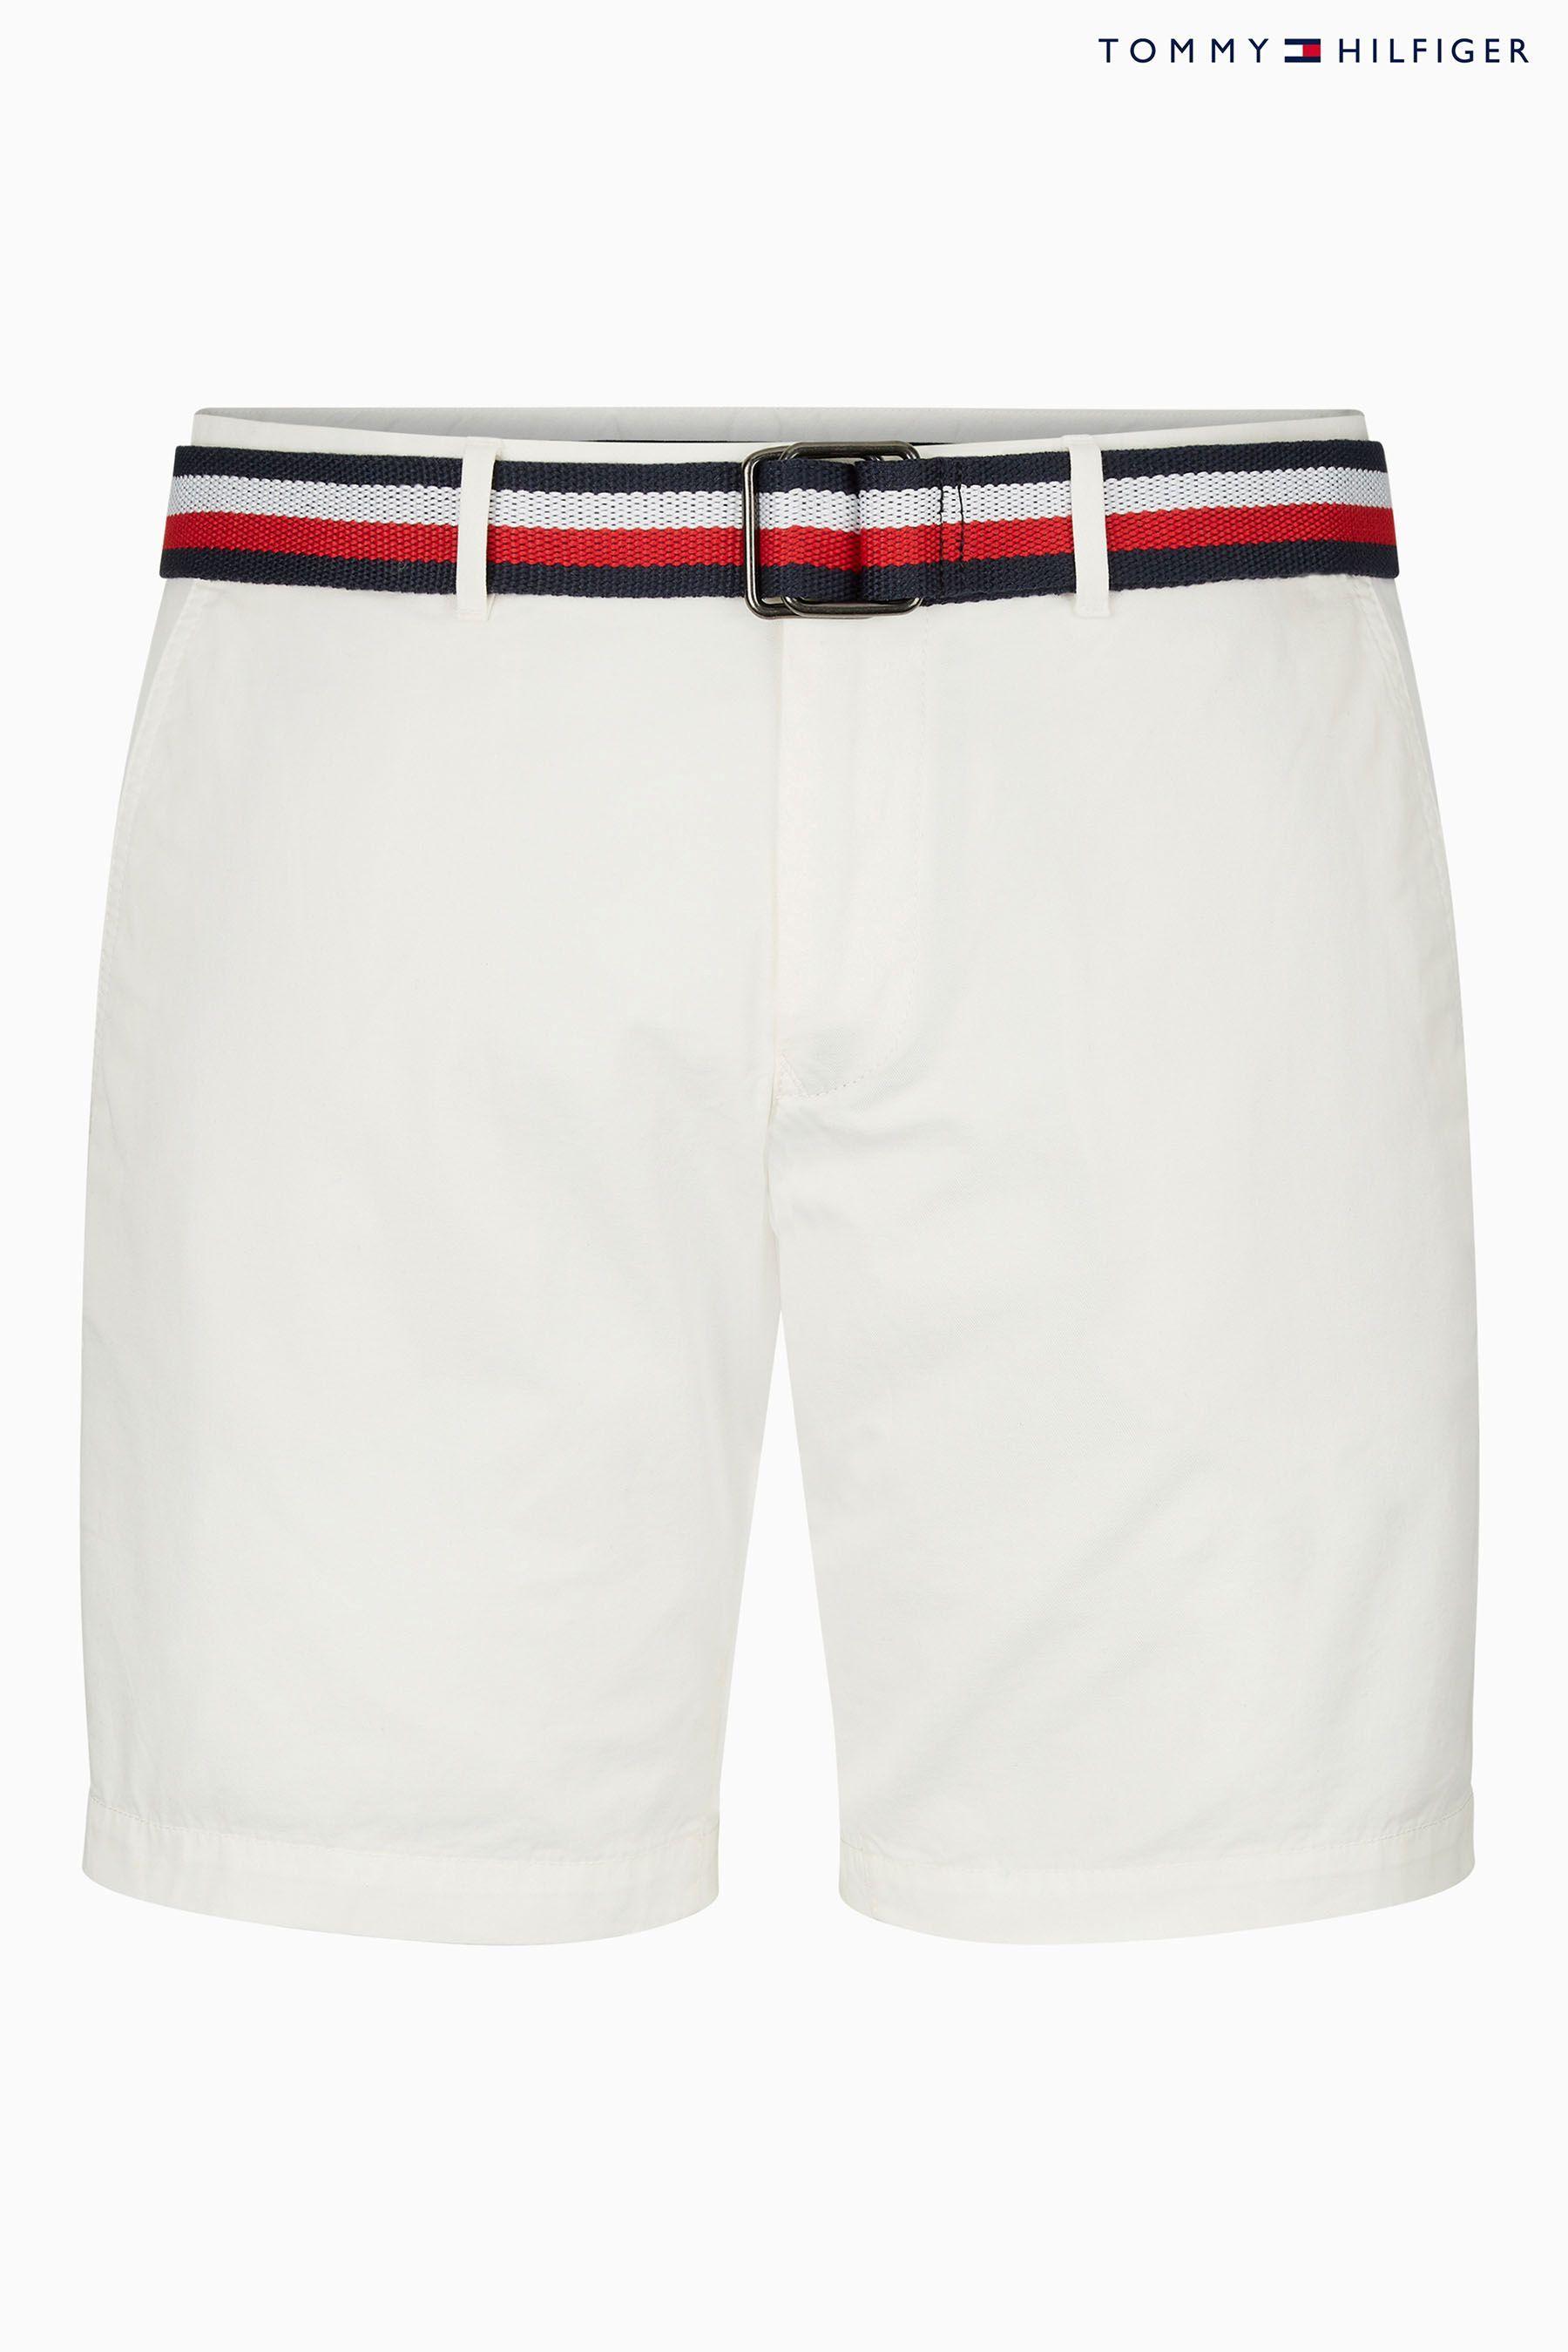 White Tommy Hilfiger Men/'s Brooklyn Shorts